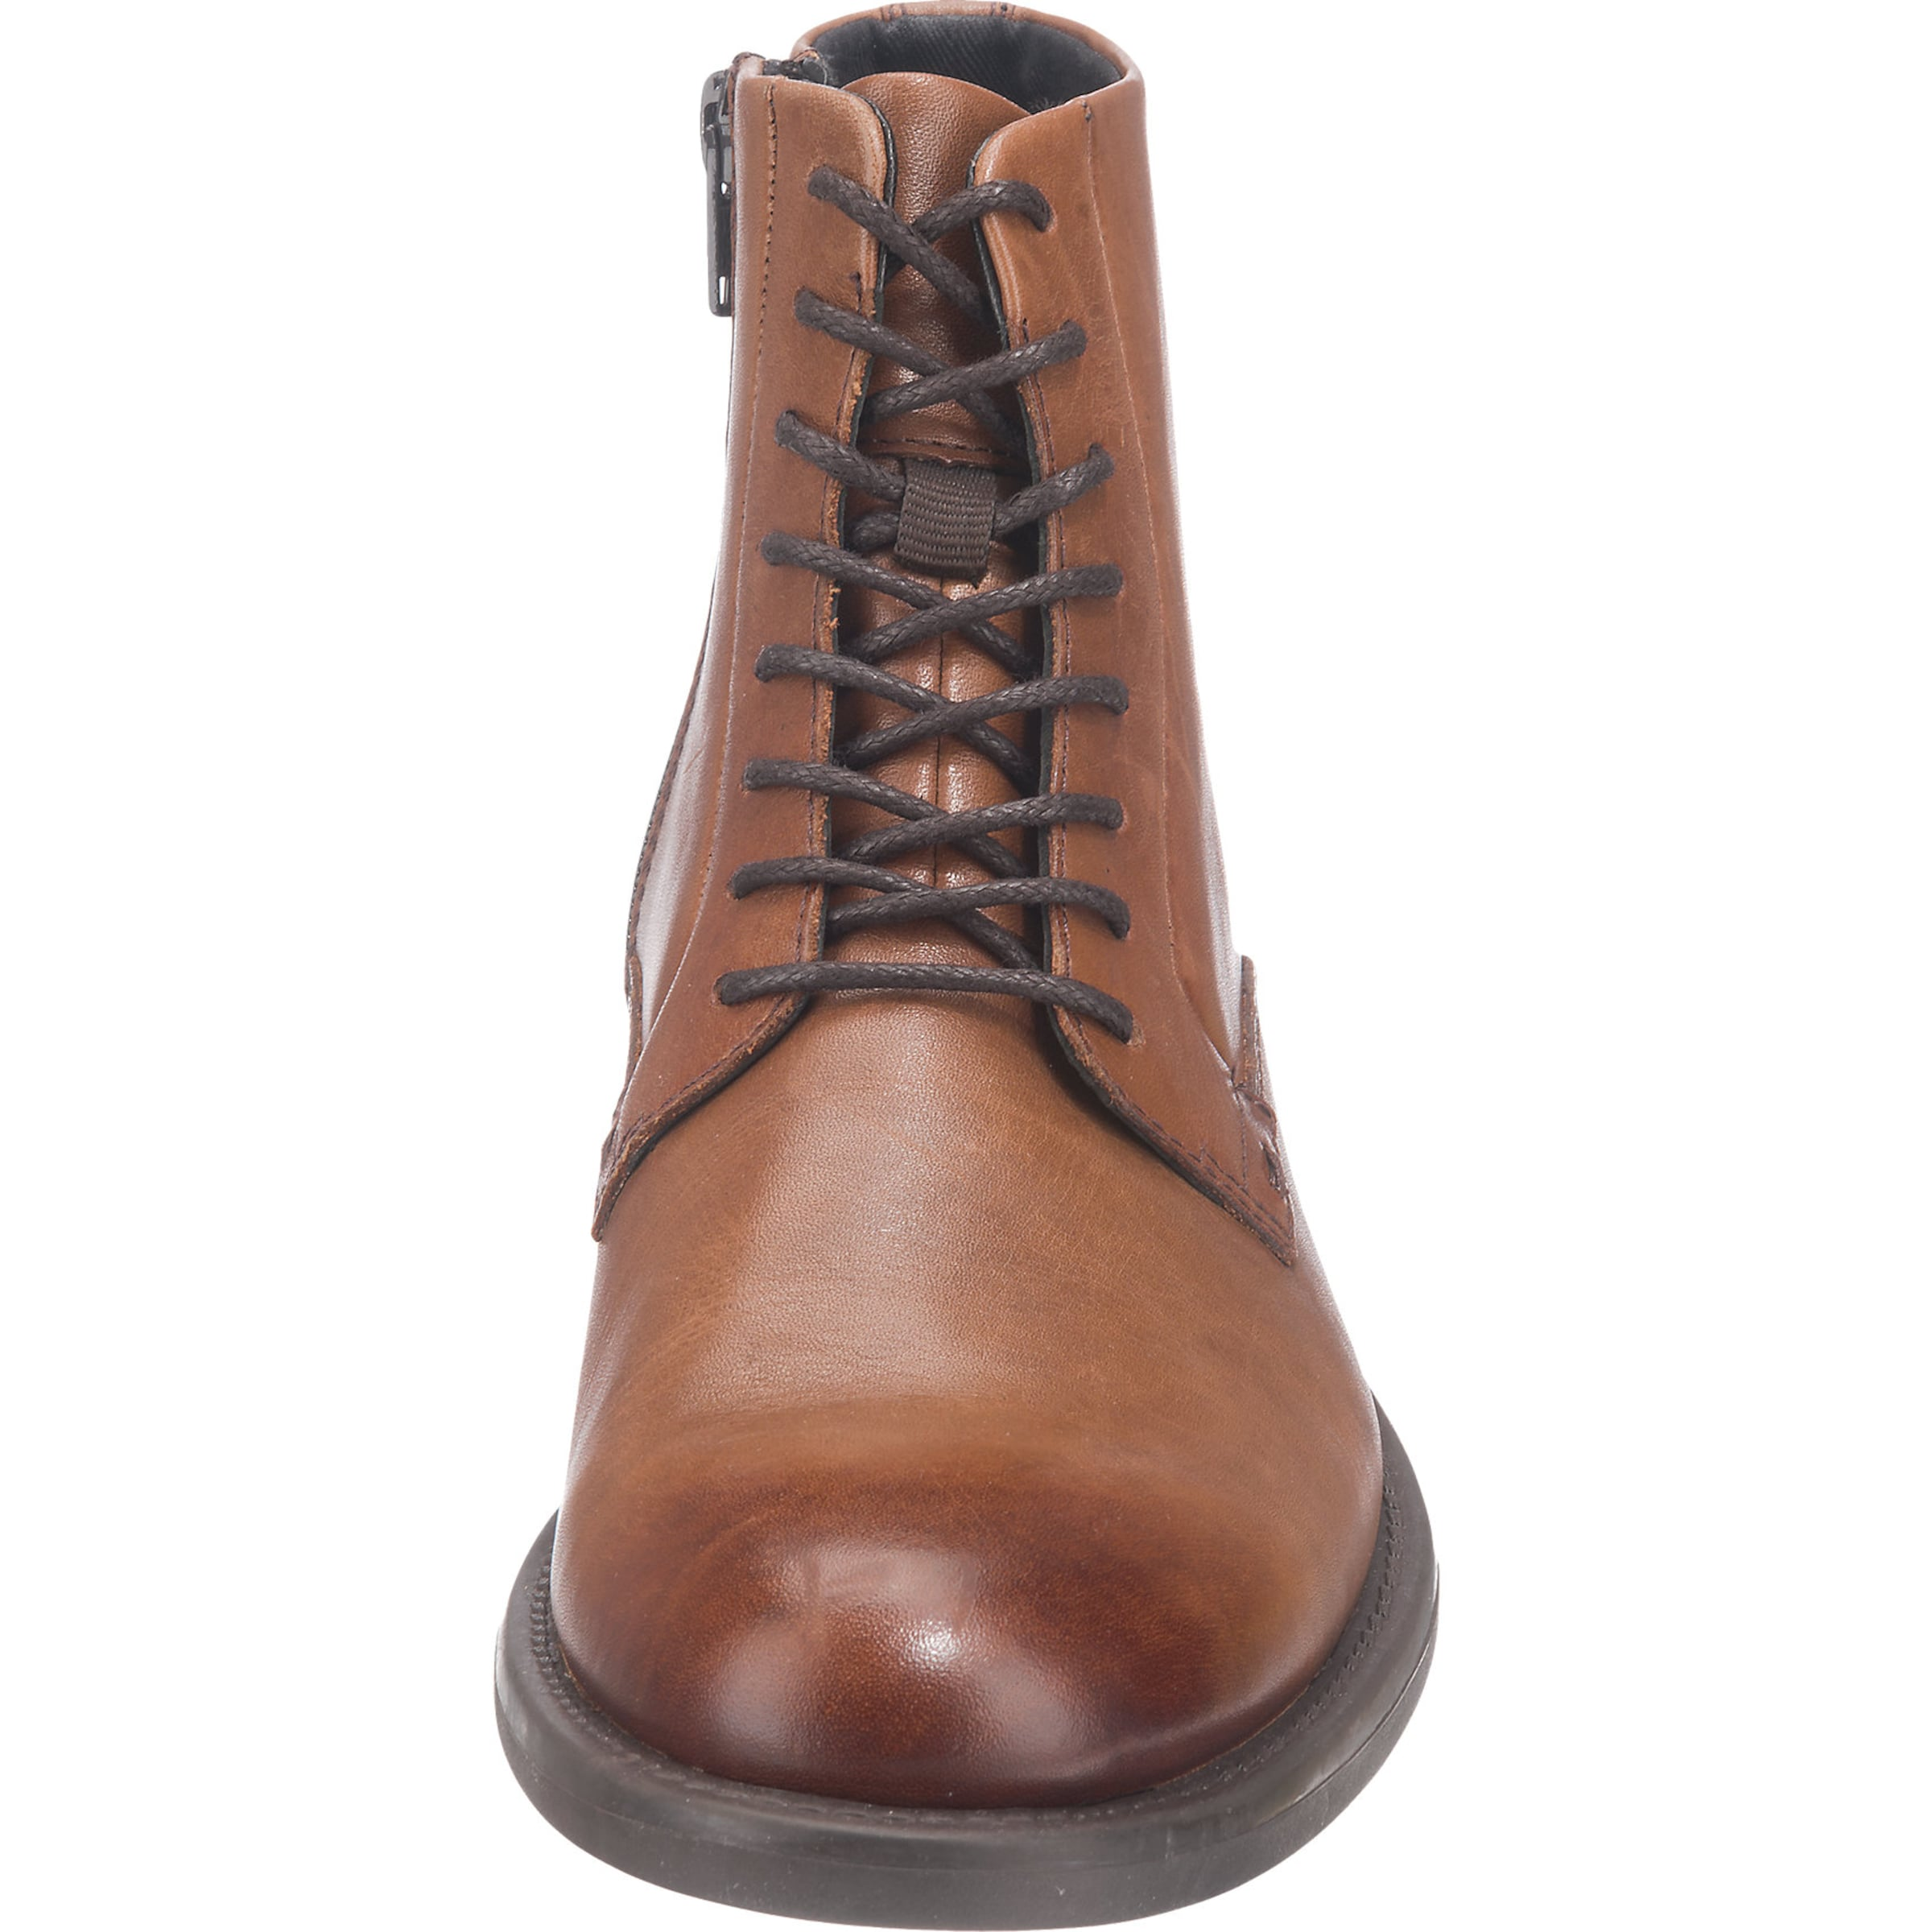 Stiefeletten Vagabond Shoemakers In 'amina' Braun uwOXiPZlkT